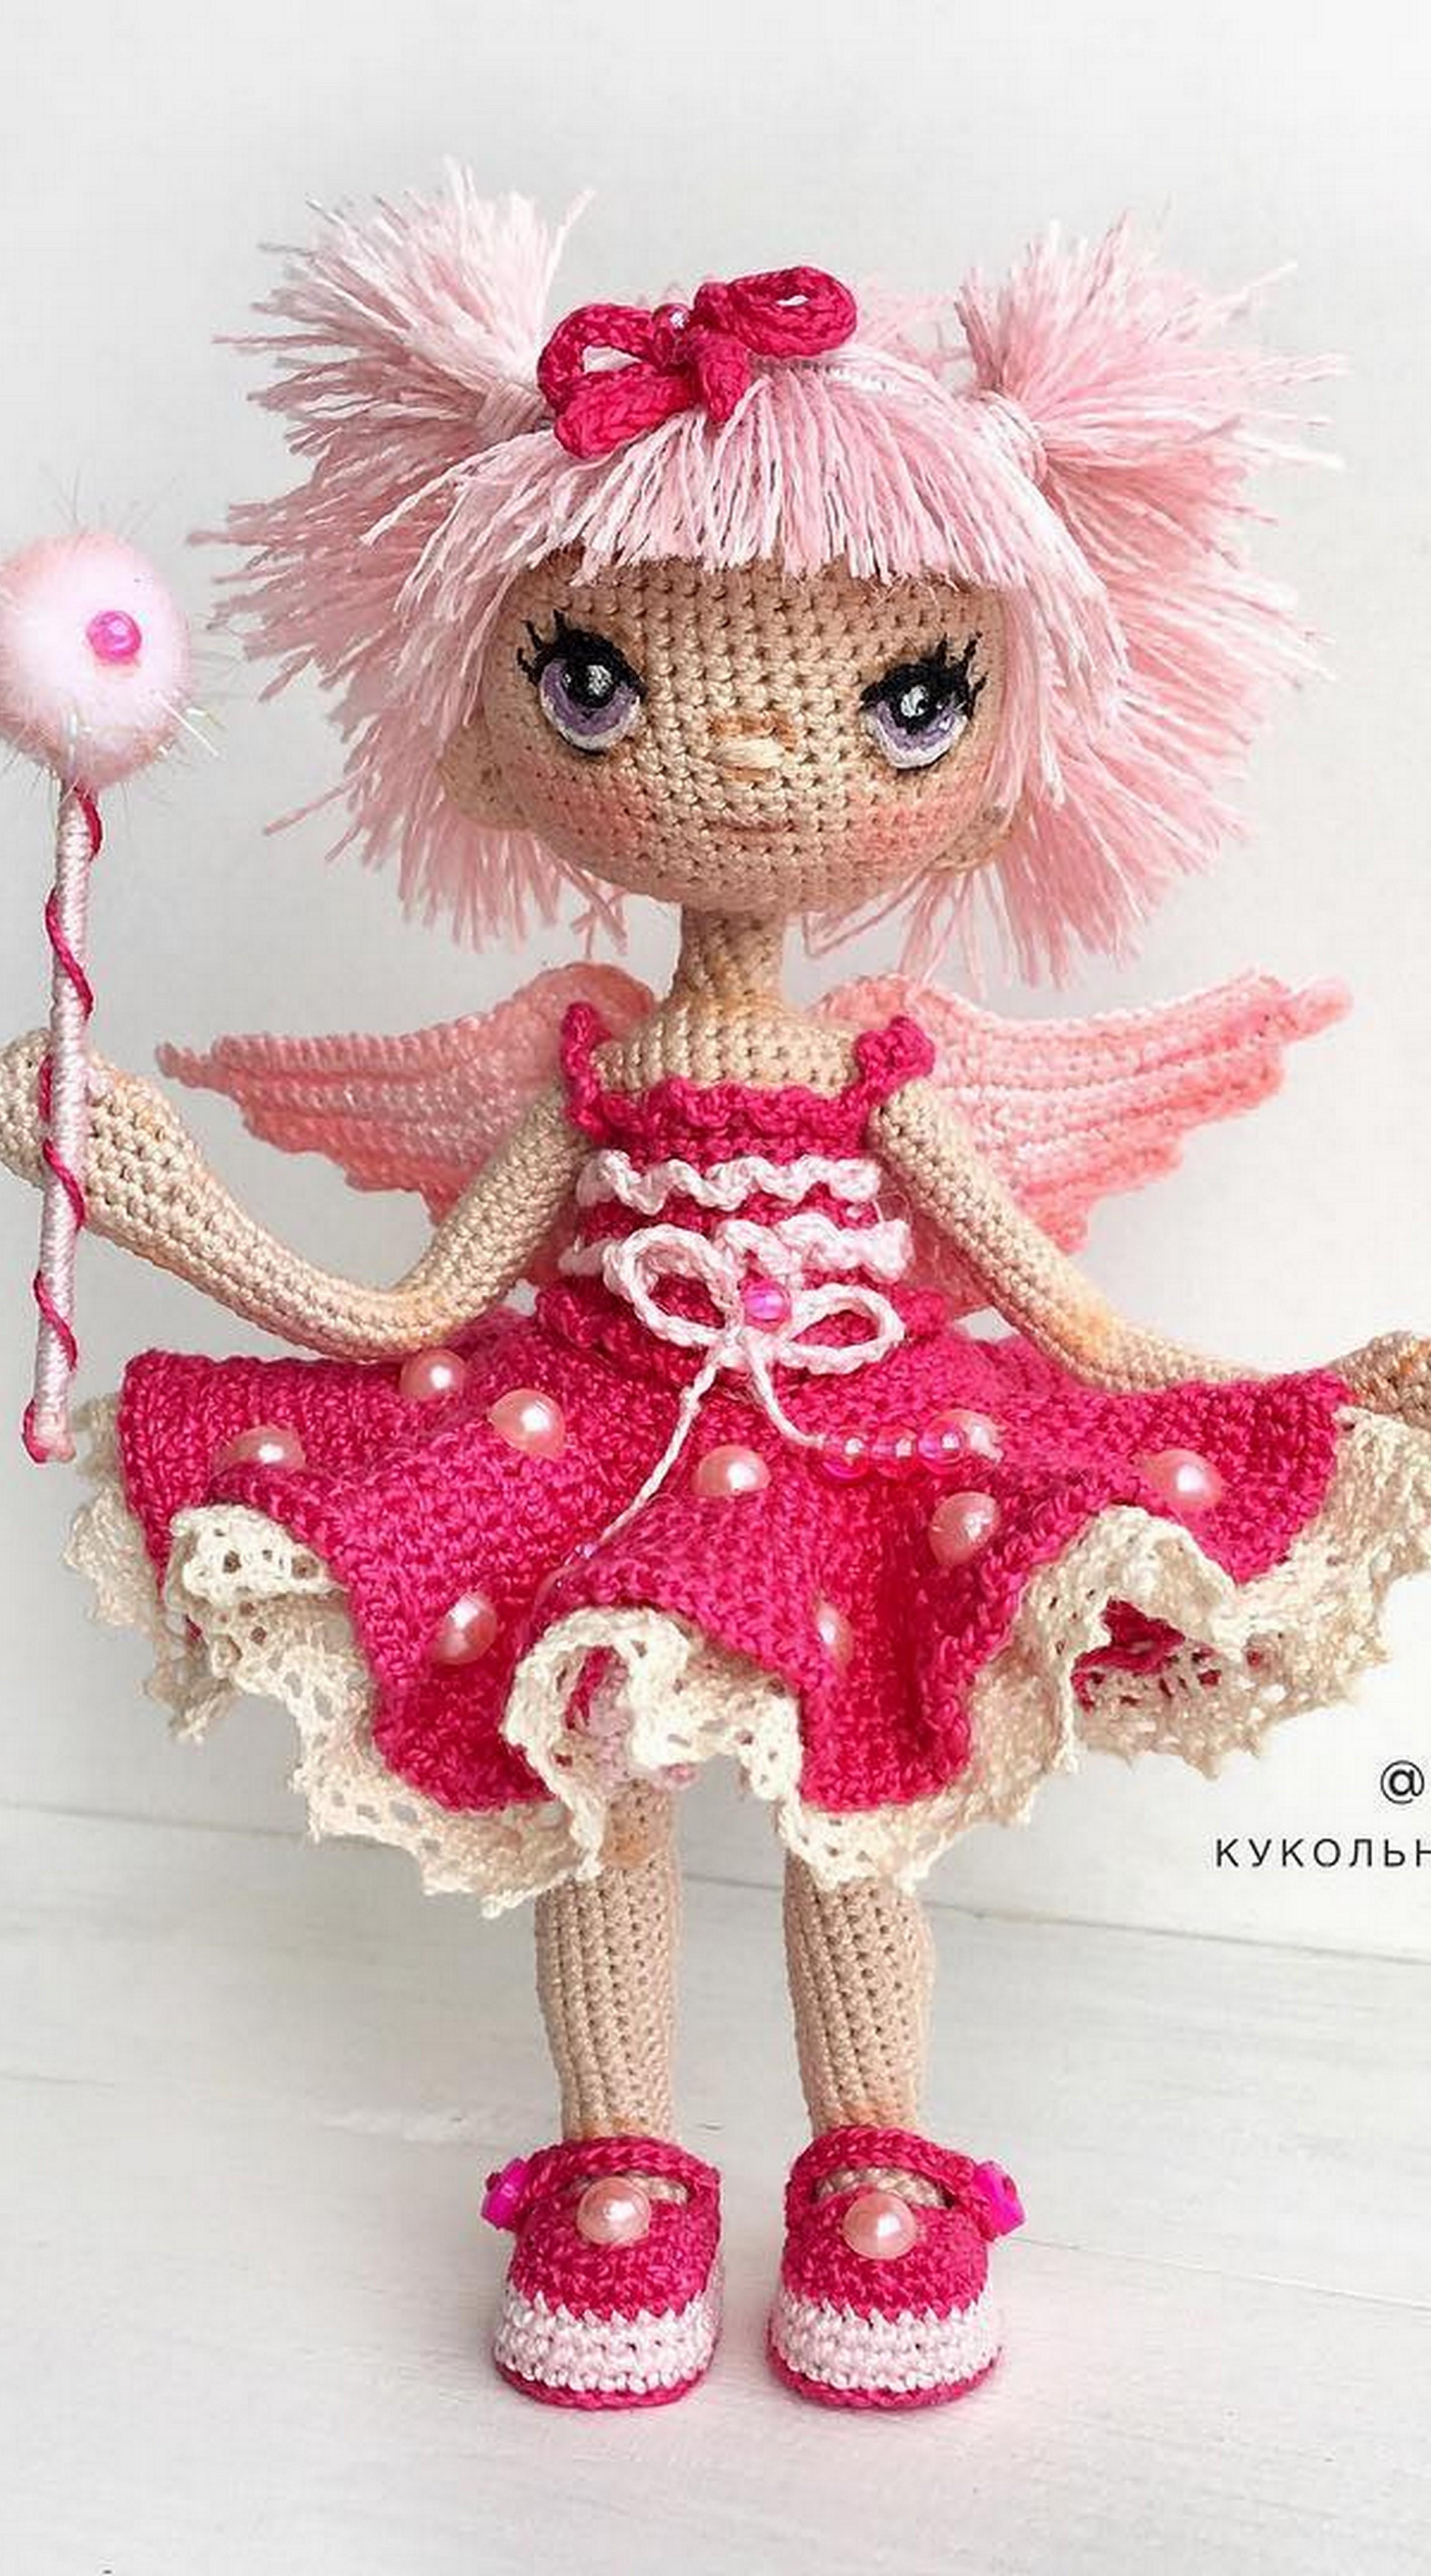 The Most Beautiful Amigurumi Doll Free Crochet Patterns